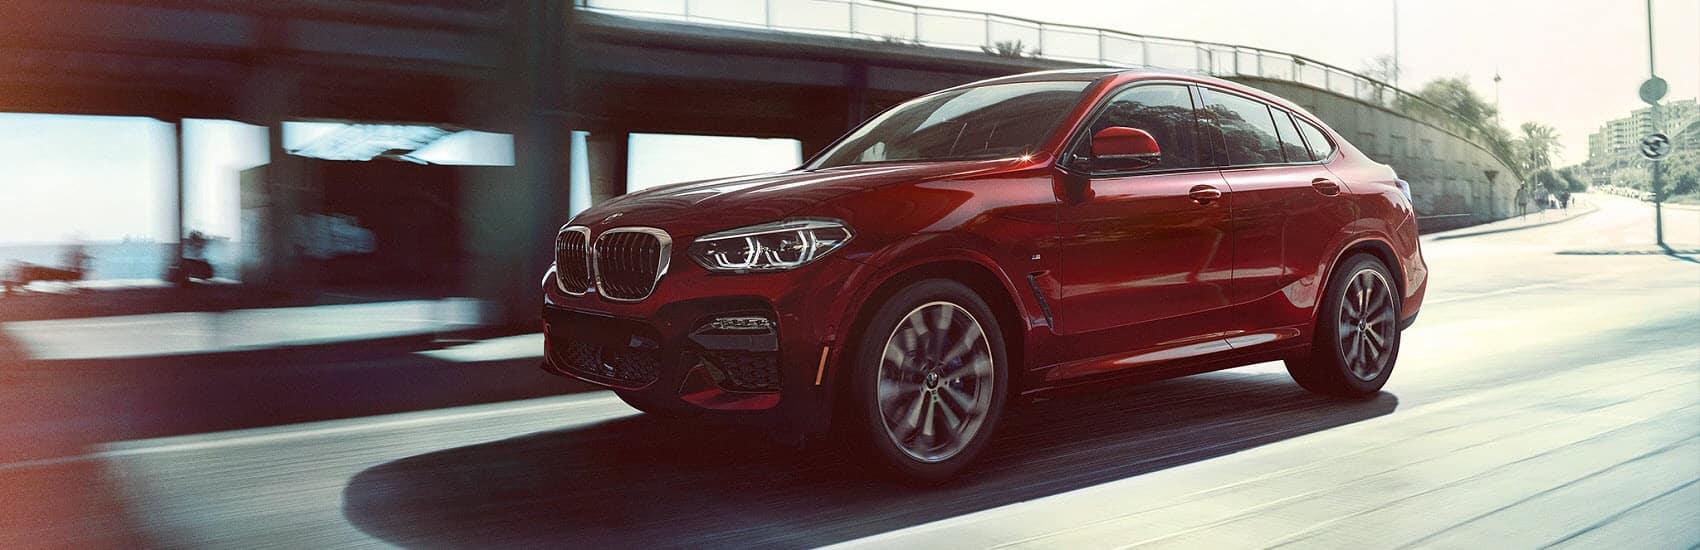 2019 BMW X4 Safety